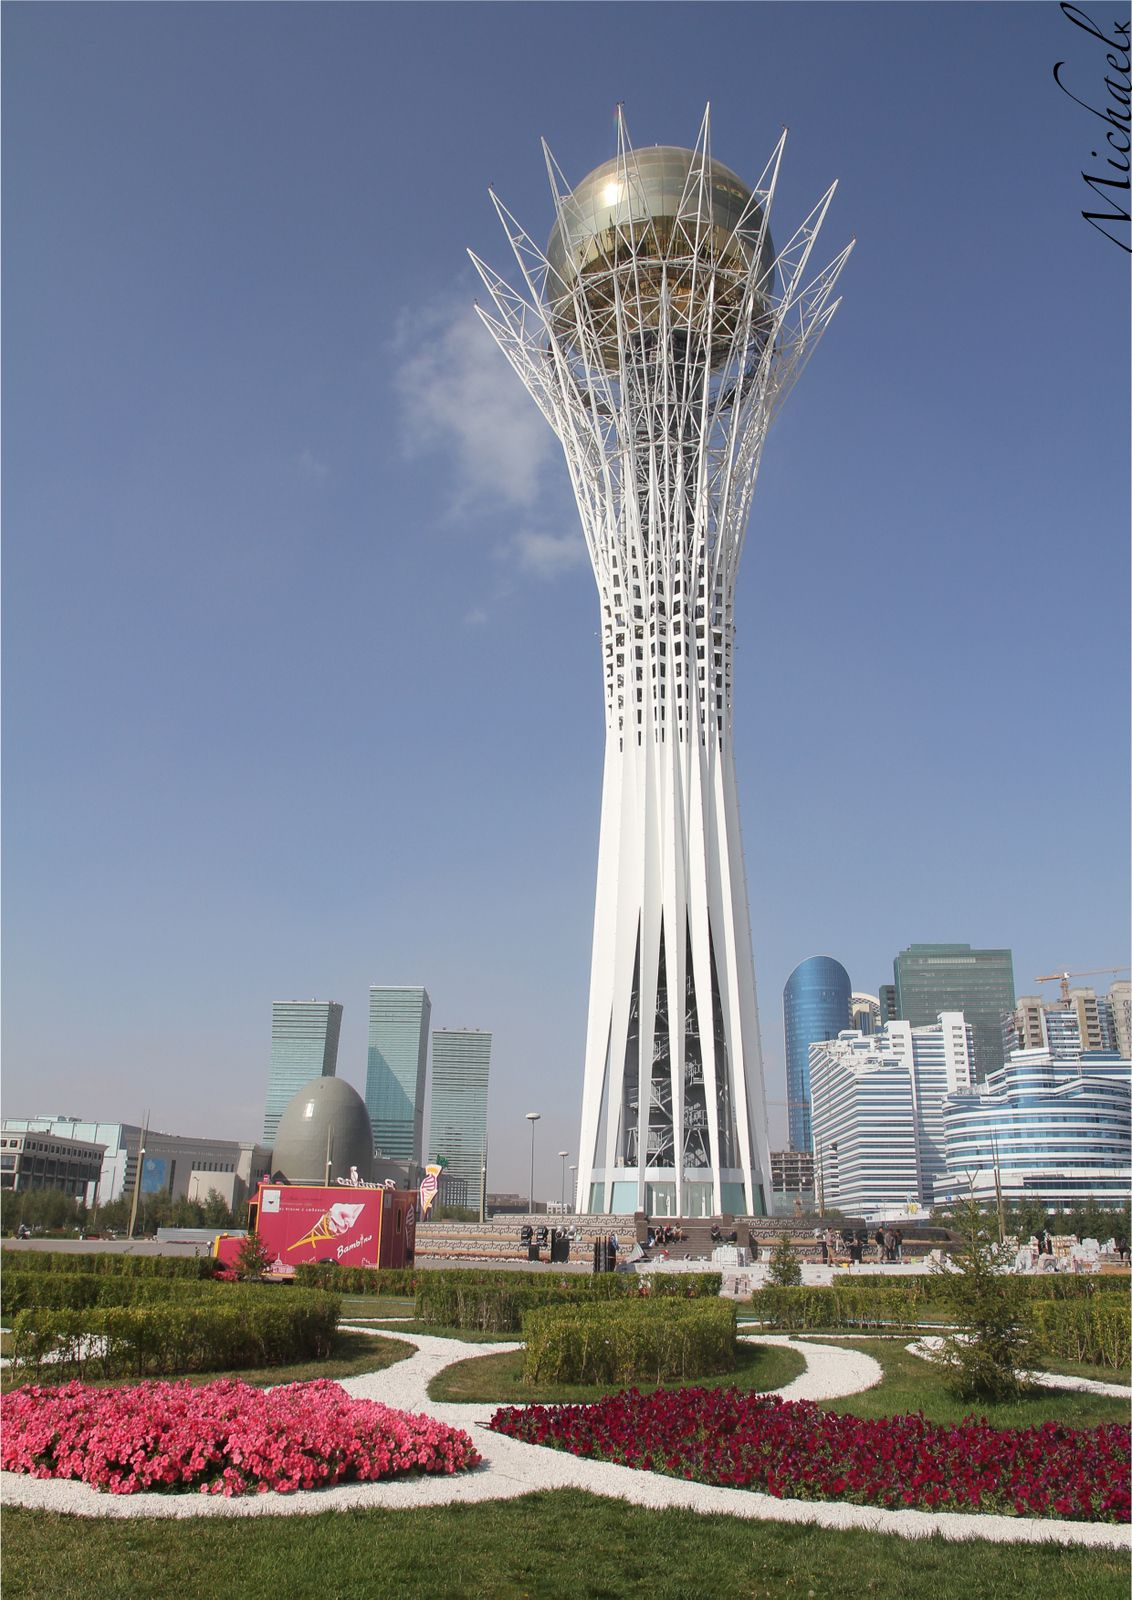 Bayterek observation tower of Astana, Kazakhstan